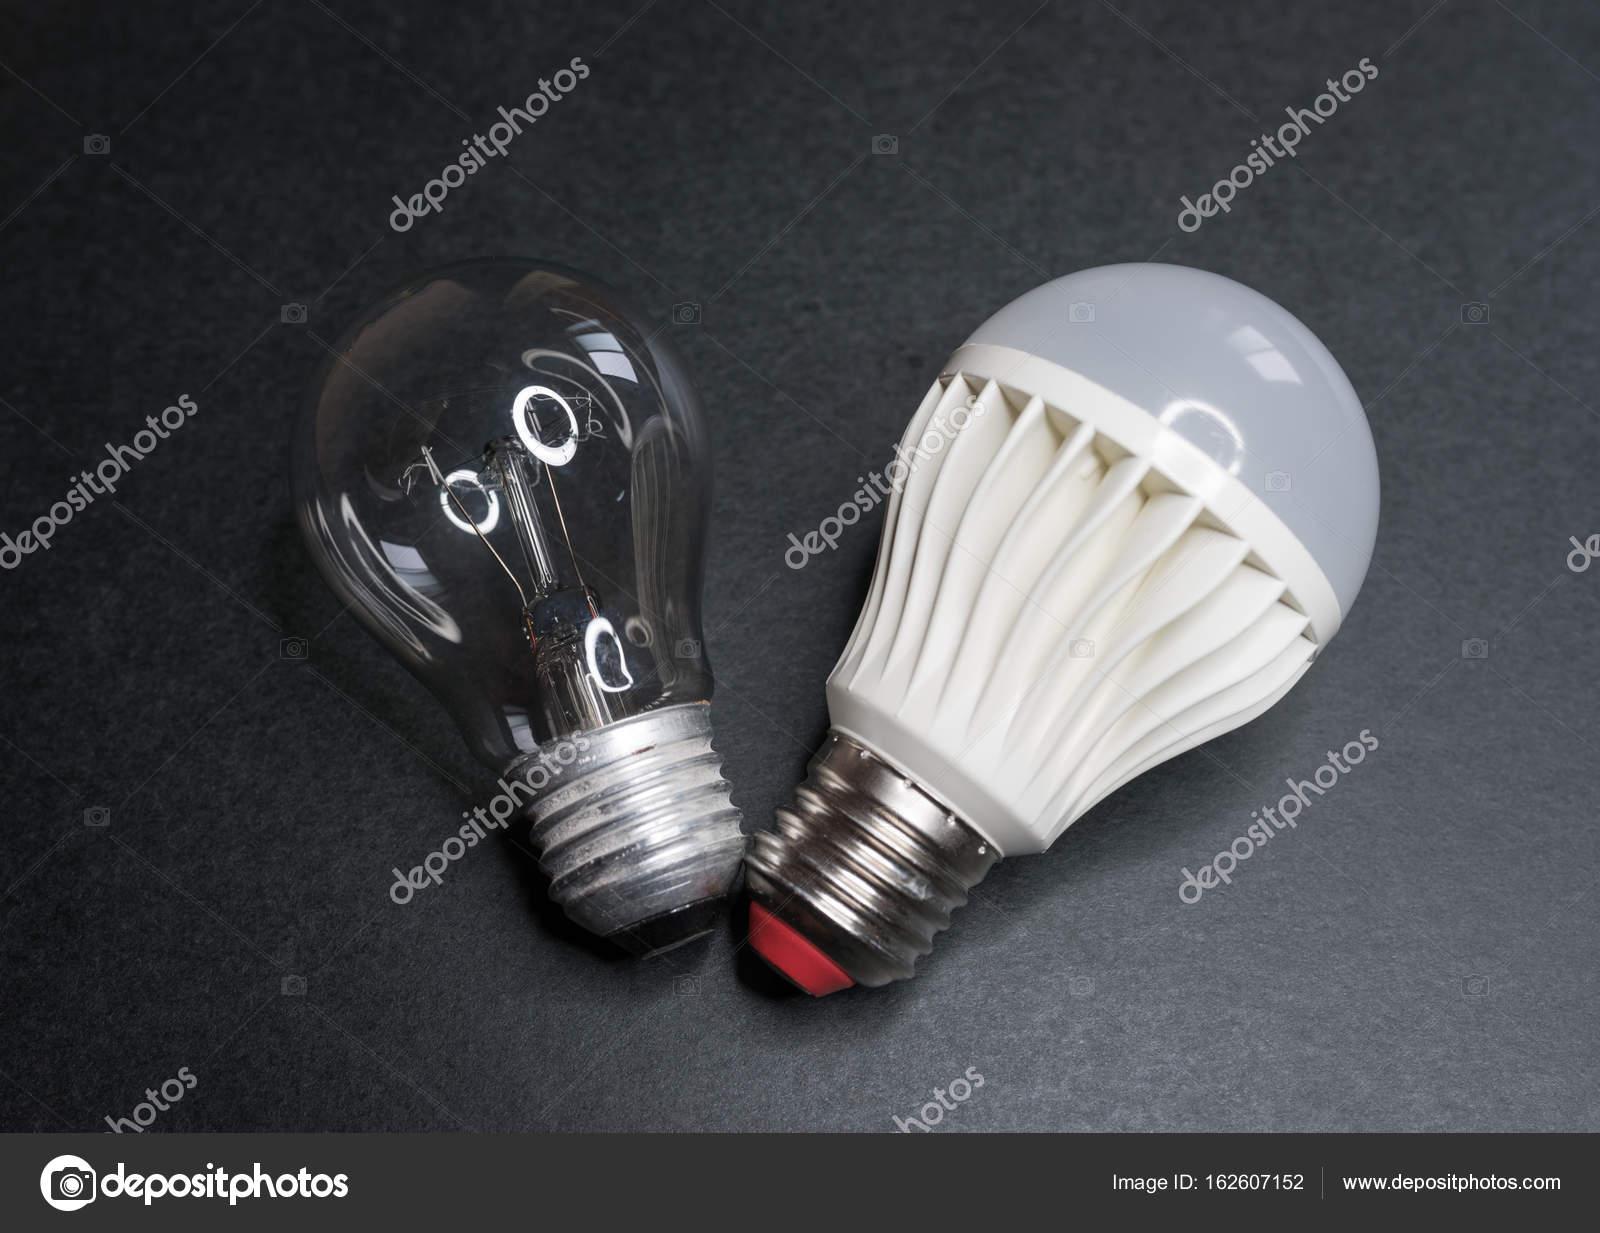 Plafoniere Slim Led Caldak : Lampada led e kit startup w smalto by charm nai